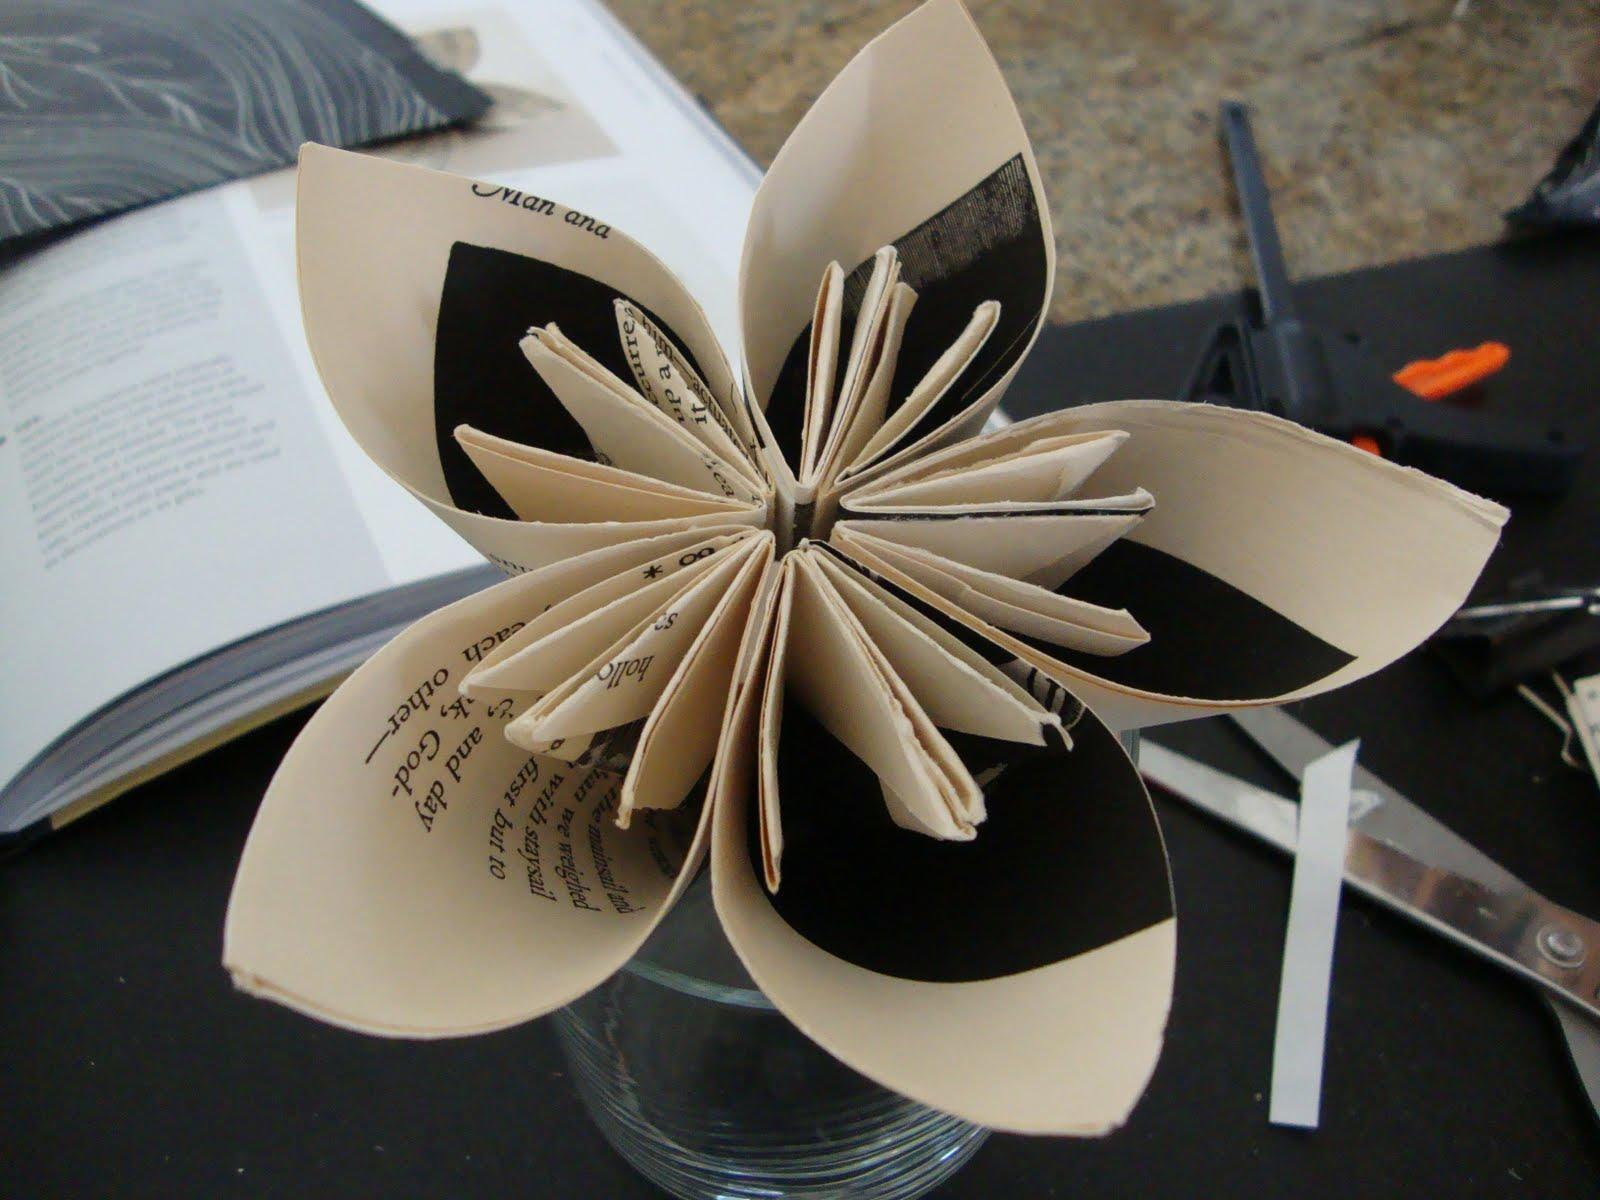 http://2.bp.blogspot.com/-rqkFZIba-VE/TbNGPrEW_9I/AAAAAAAAFyQ/eiPiik4hIlw/s1600/flowers%2Bfrom%2Bpaper%2B2011%2B005.JPG